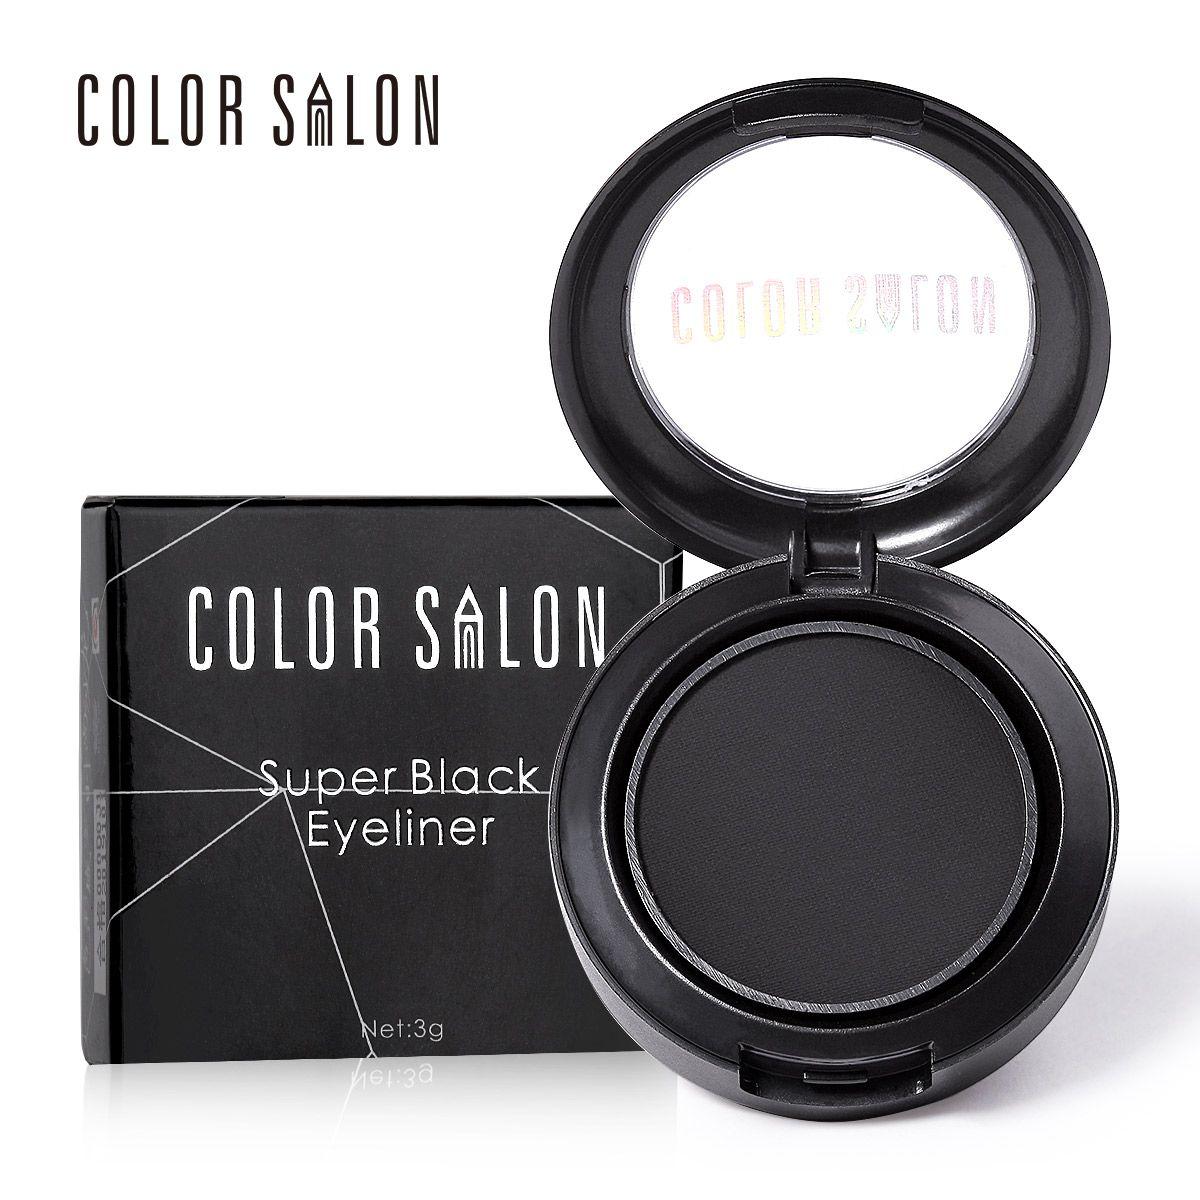 Color Salon Black Eyeliner Powder Long-Wear Eyeliner Gel With Brush 24hours Waterproof Sweat Not Blooming Smudge proof 3g